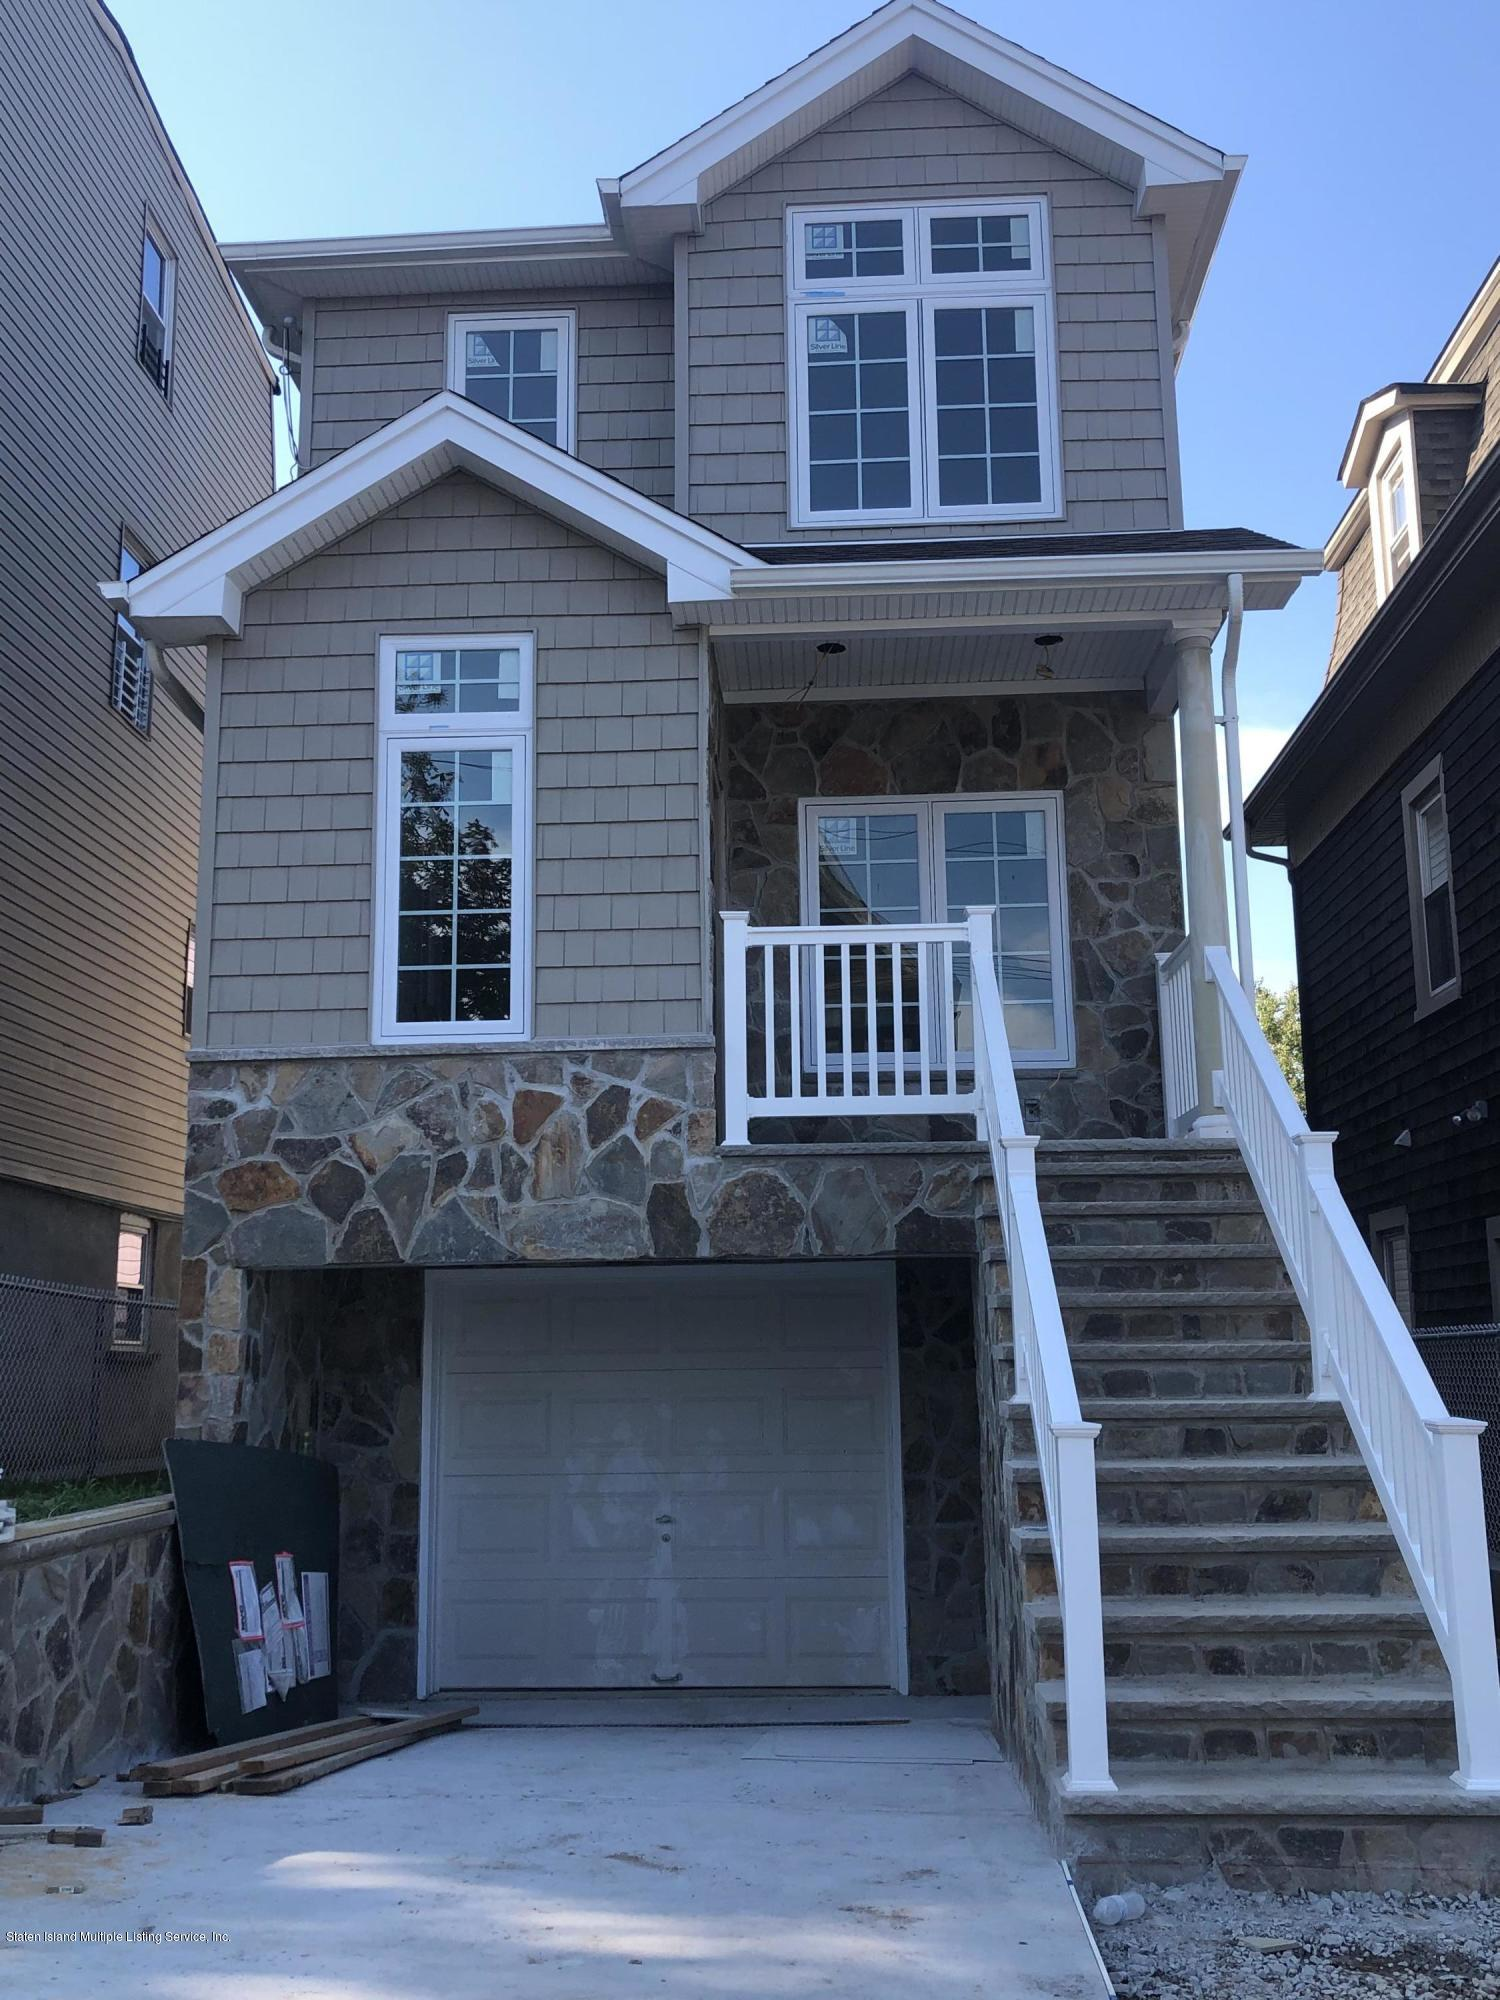 Single Family - Detached 30 Scribner Avenue  Staten Island, NY 10301, MLS-1128103-12